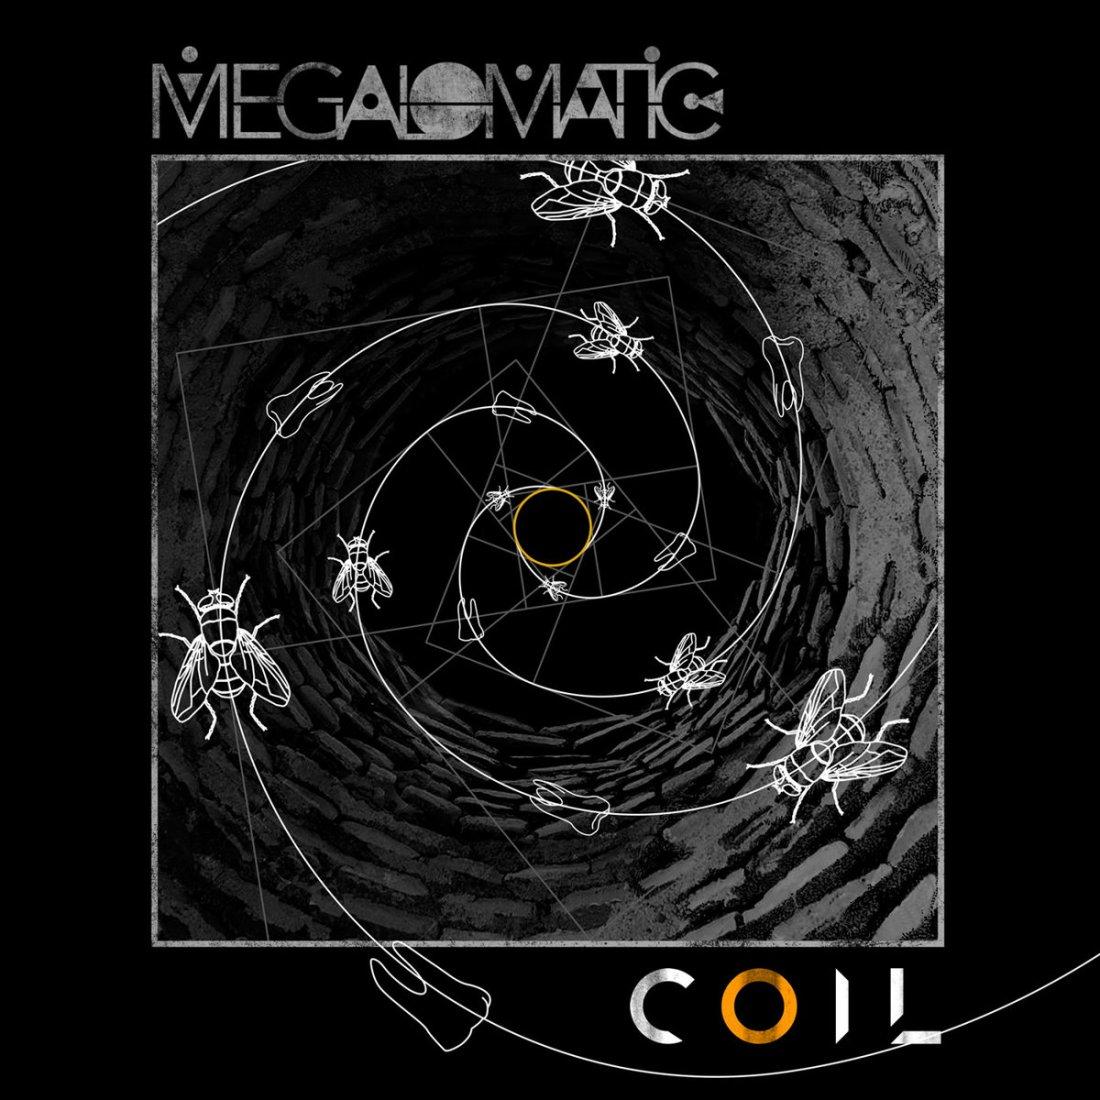 Megalomatic 'Coil' Artwork